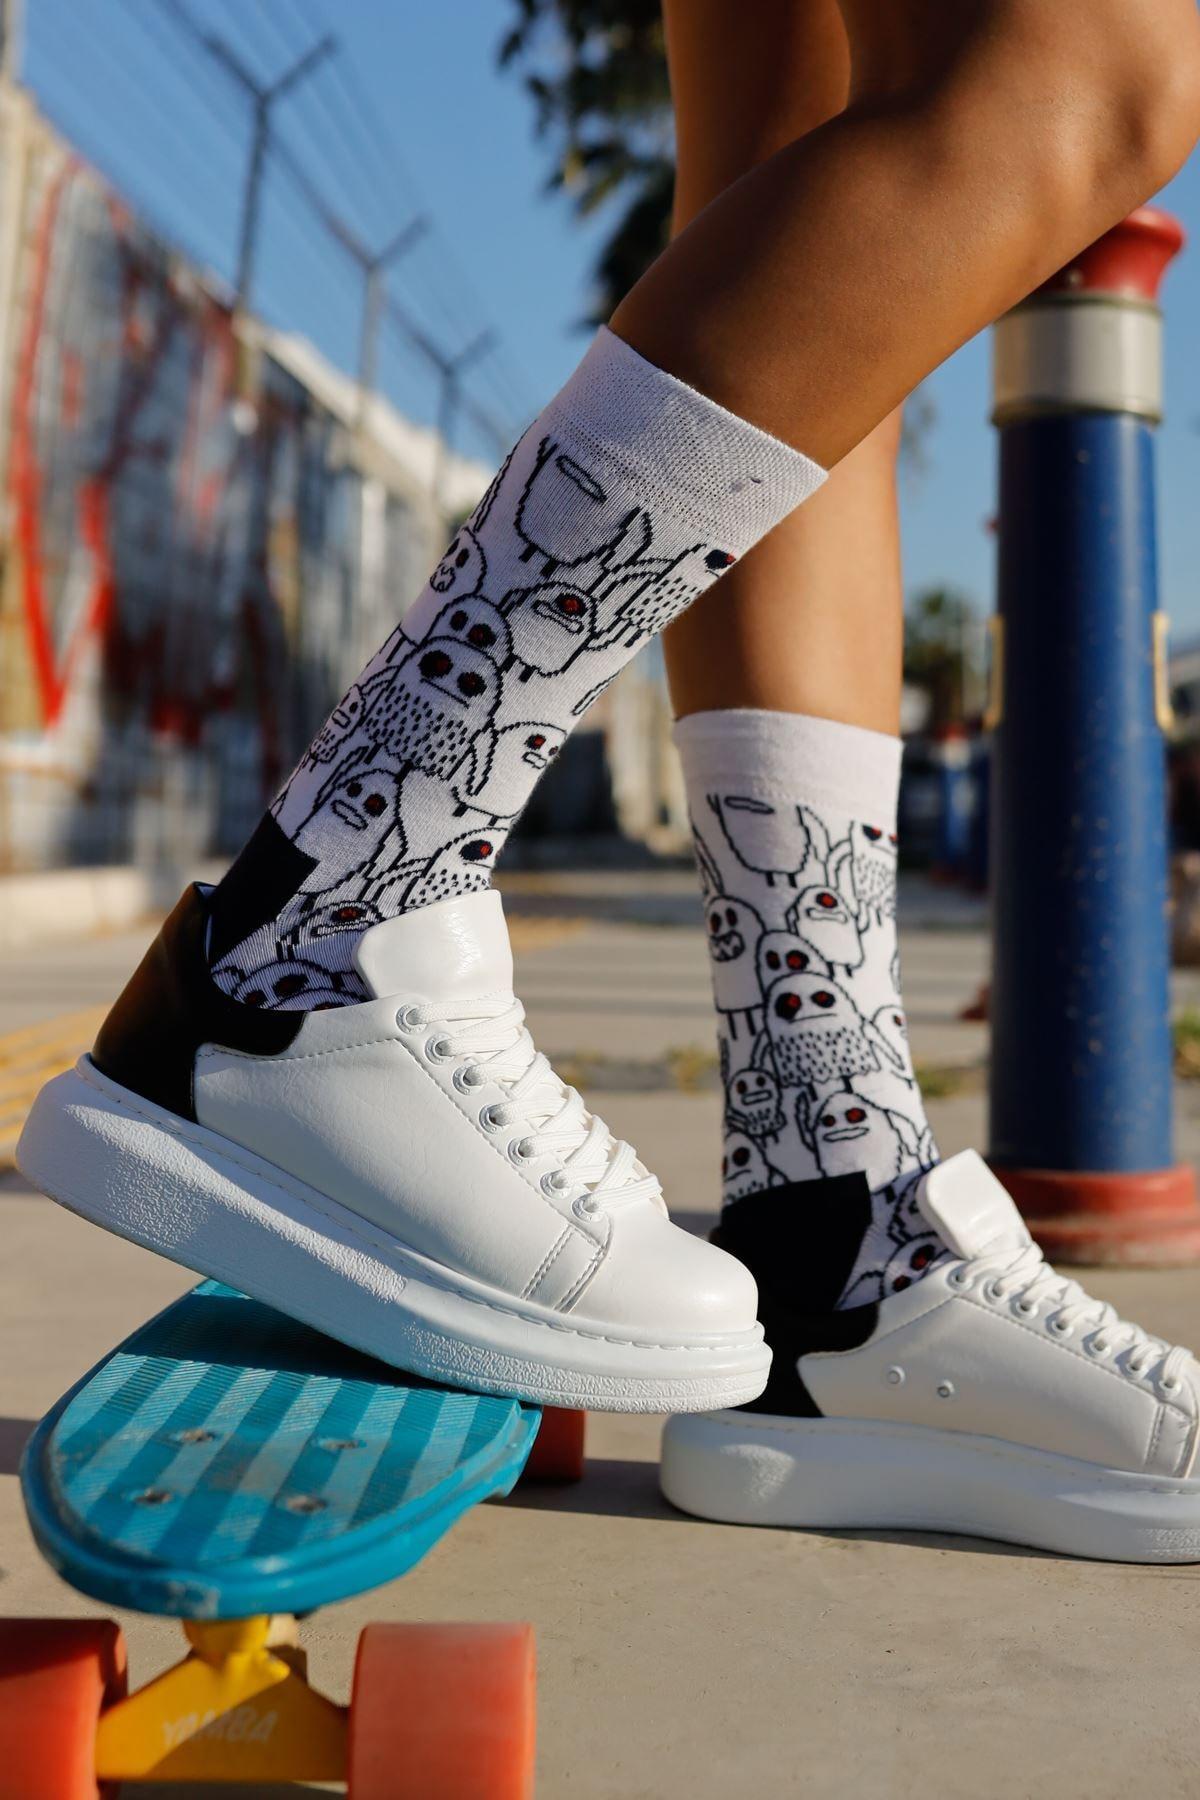 Chekich Kadın Beyaz / Siyah Ayakkabı  Ch256 Bt 1